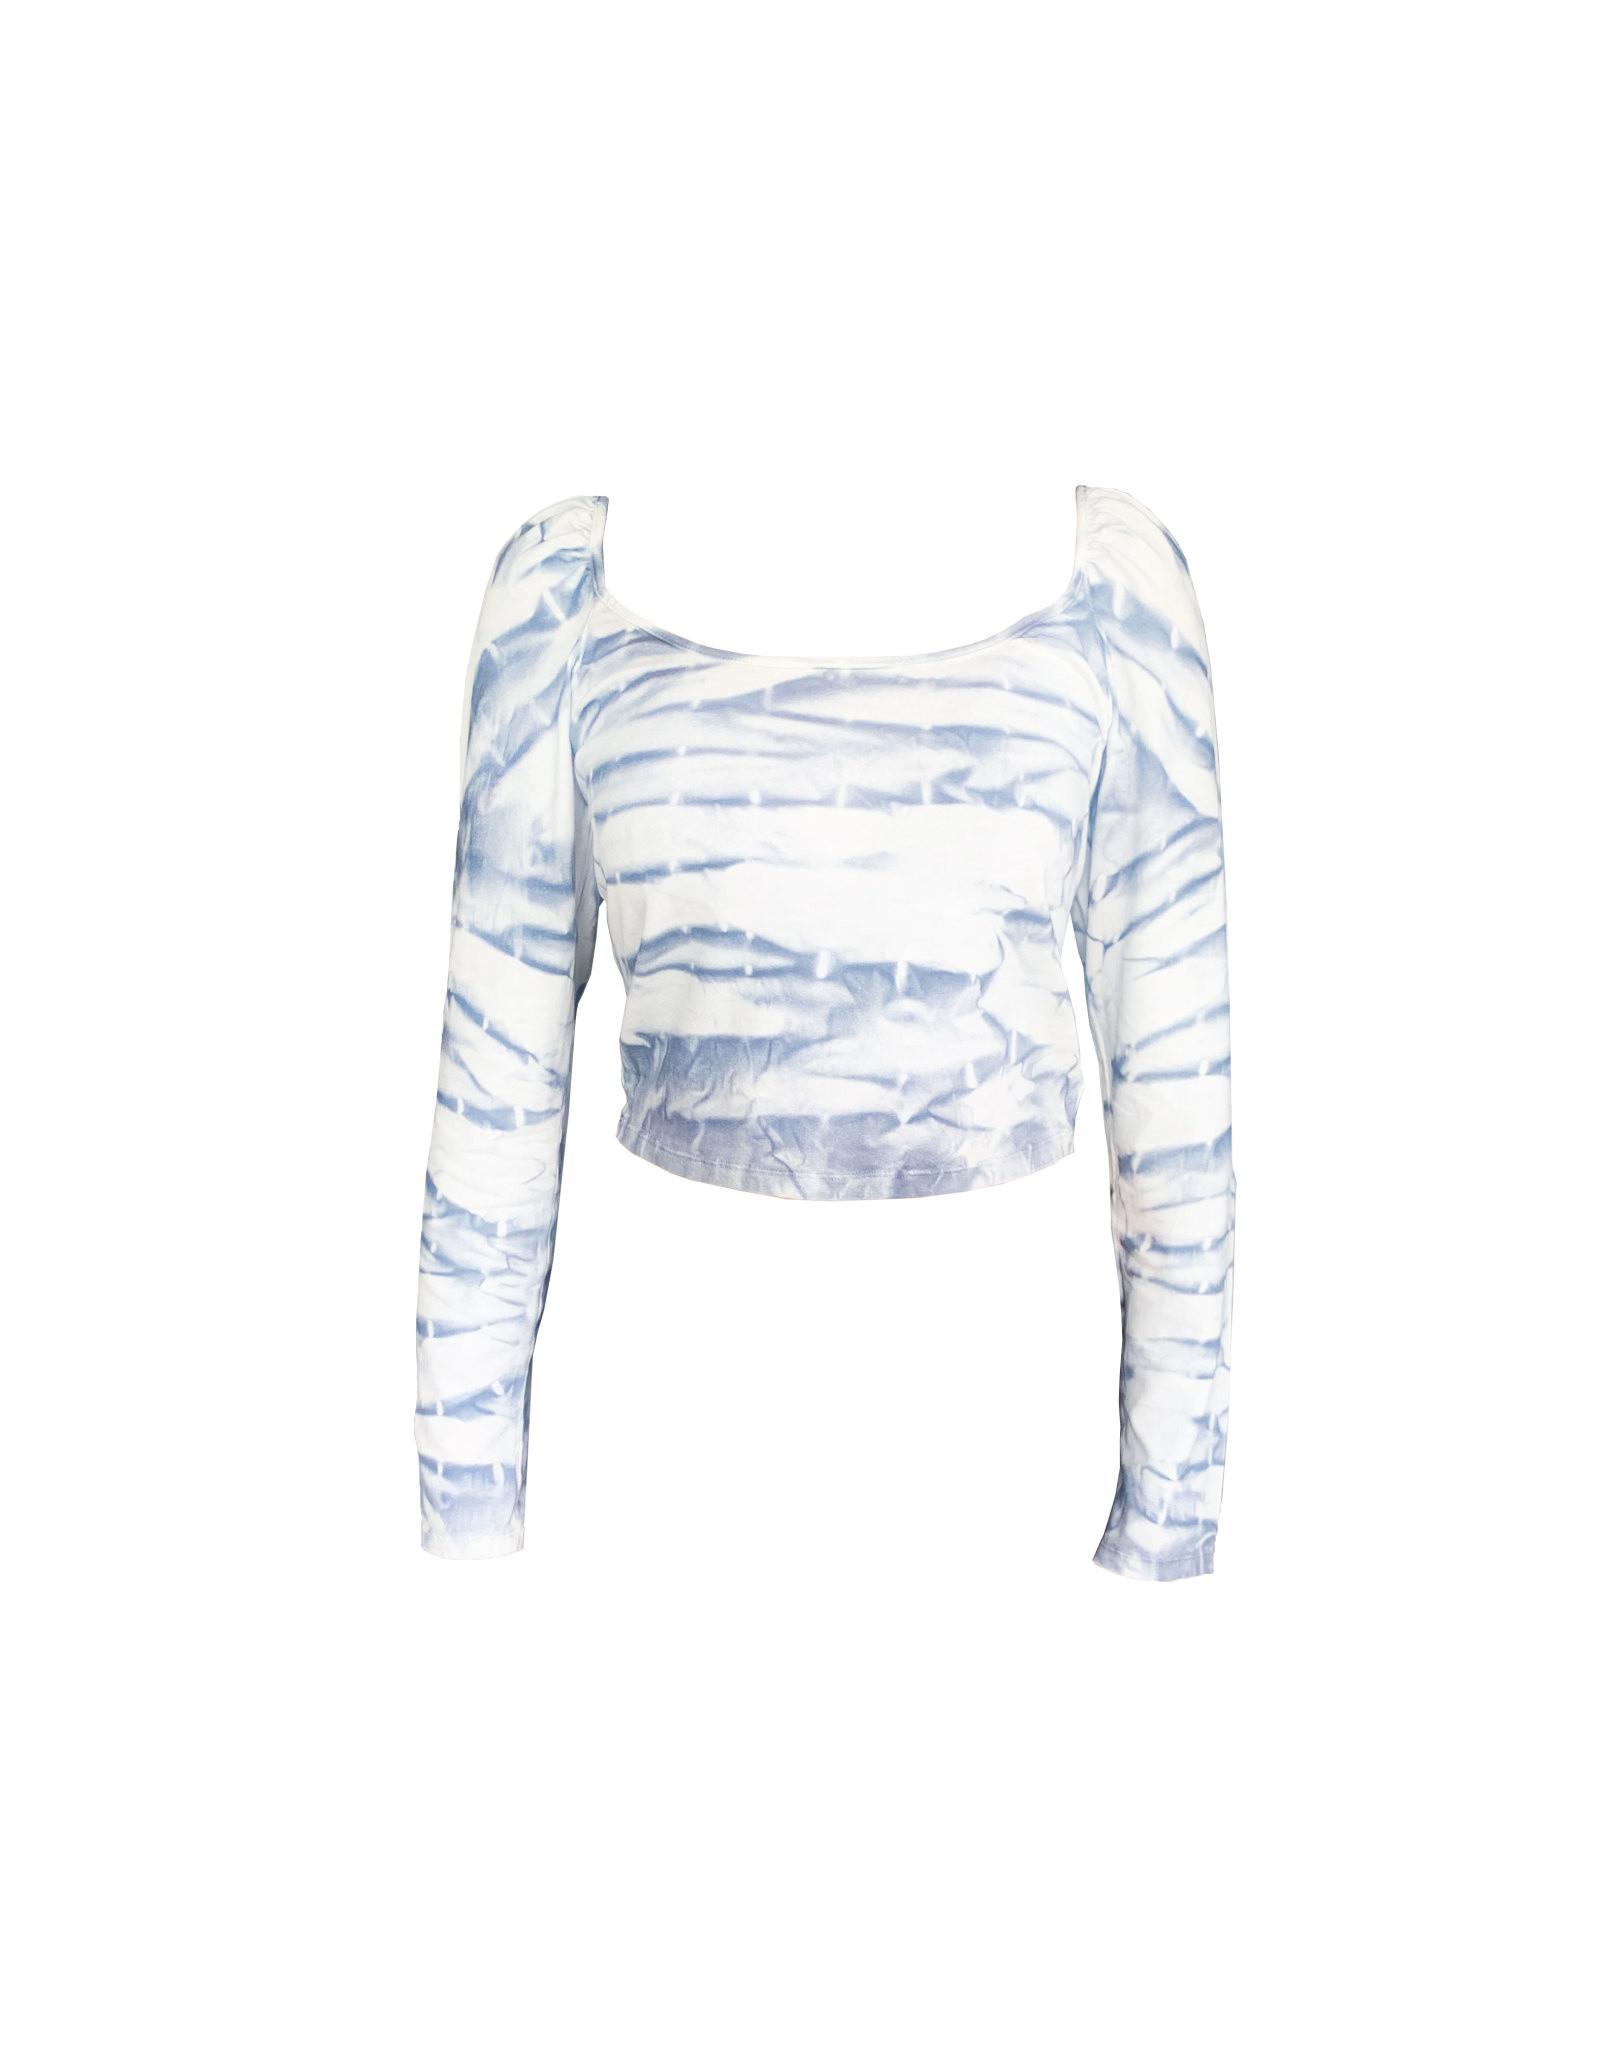 NA-KD NA-KD  Tie Dye Long Sleeve  Top SizeL